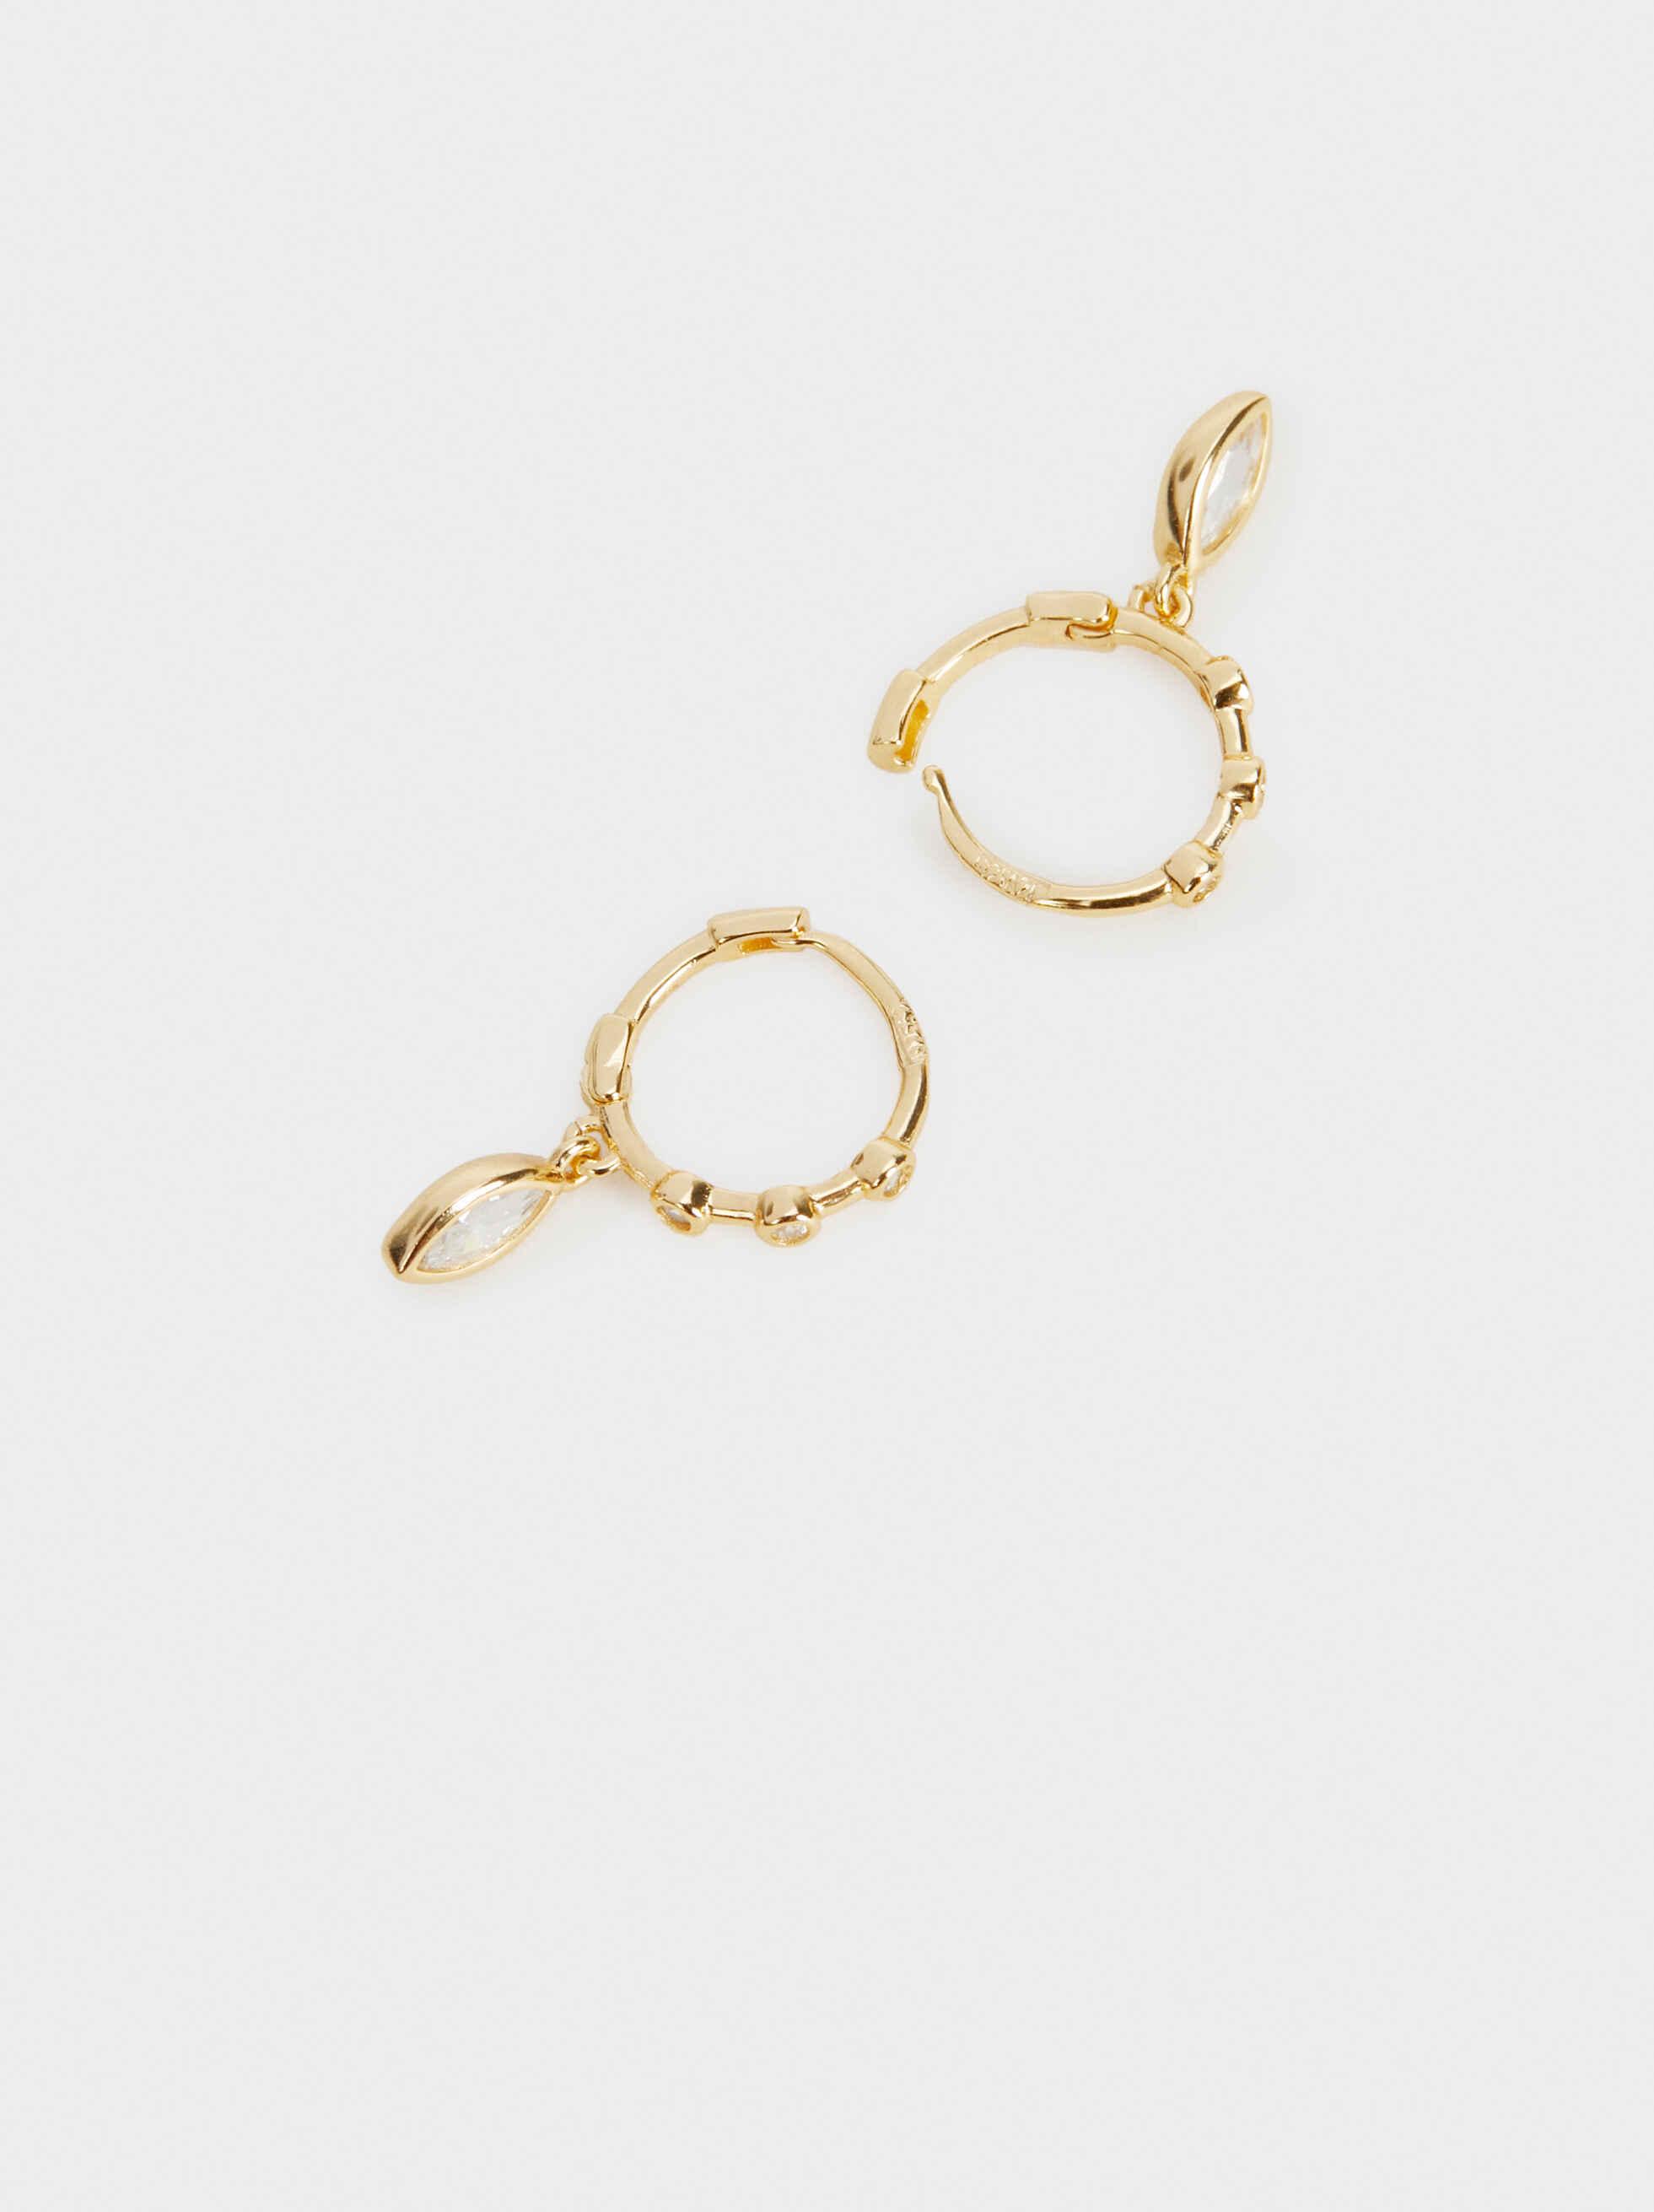 925 Silver Hoop Earrings With Pendant, Golden, hi-res